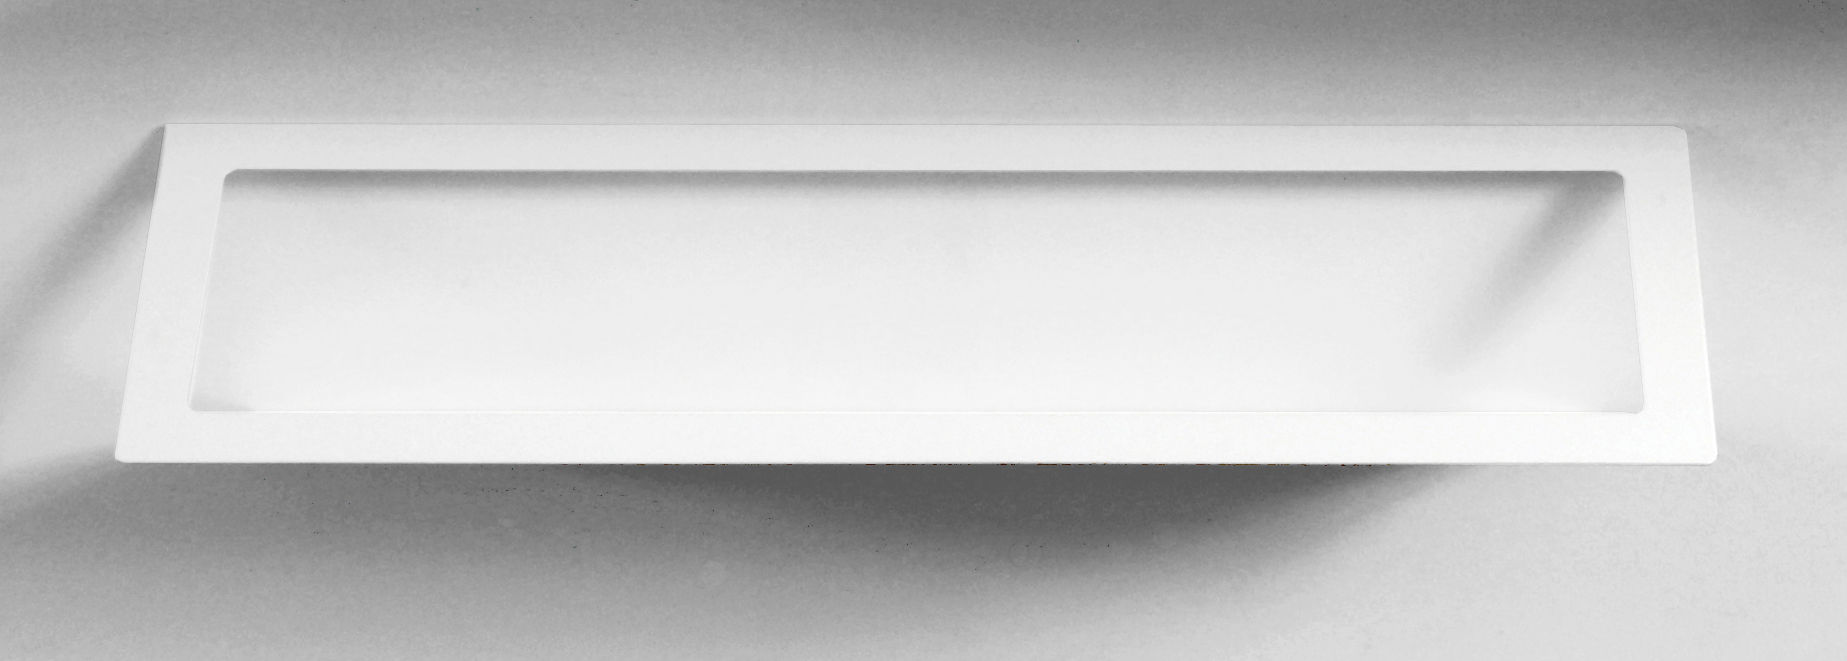 etag re air l 120 cm blanc zeus. Black Bedroom Furniture Sets. Home Design Ideas